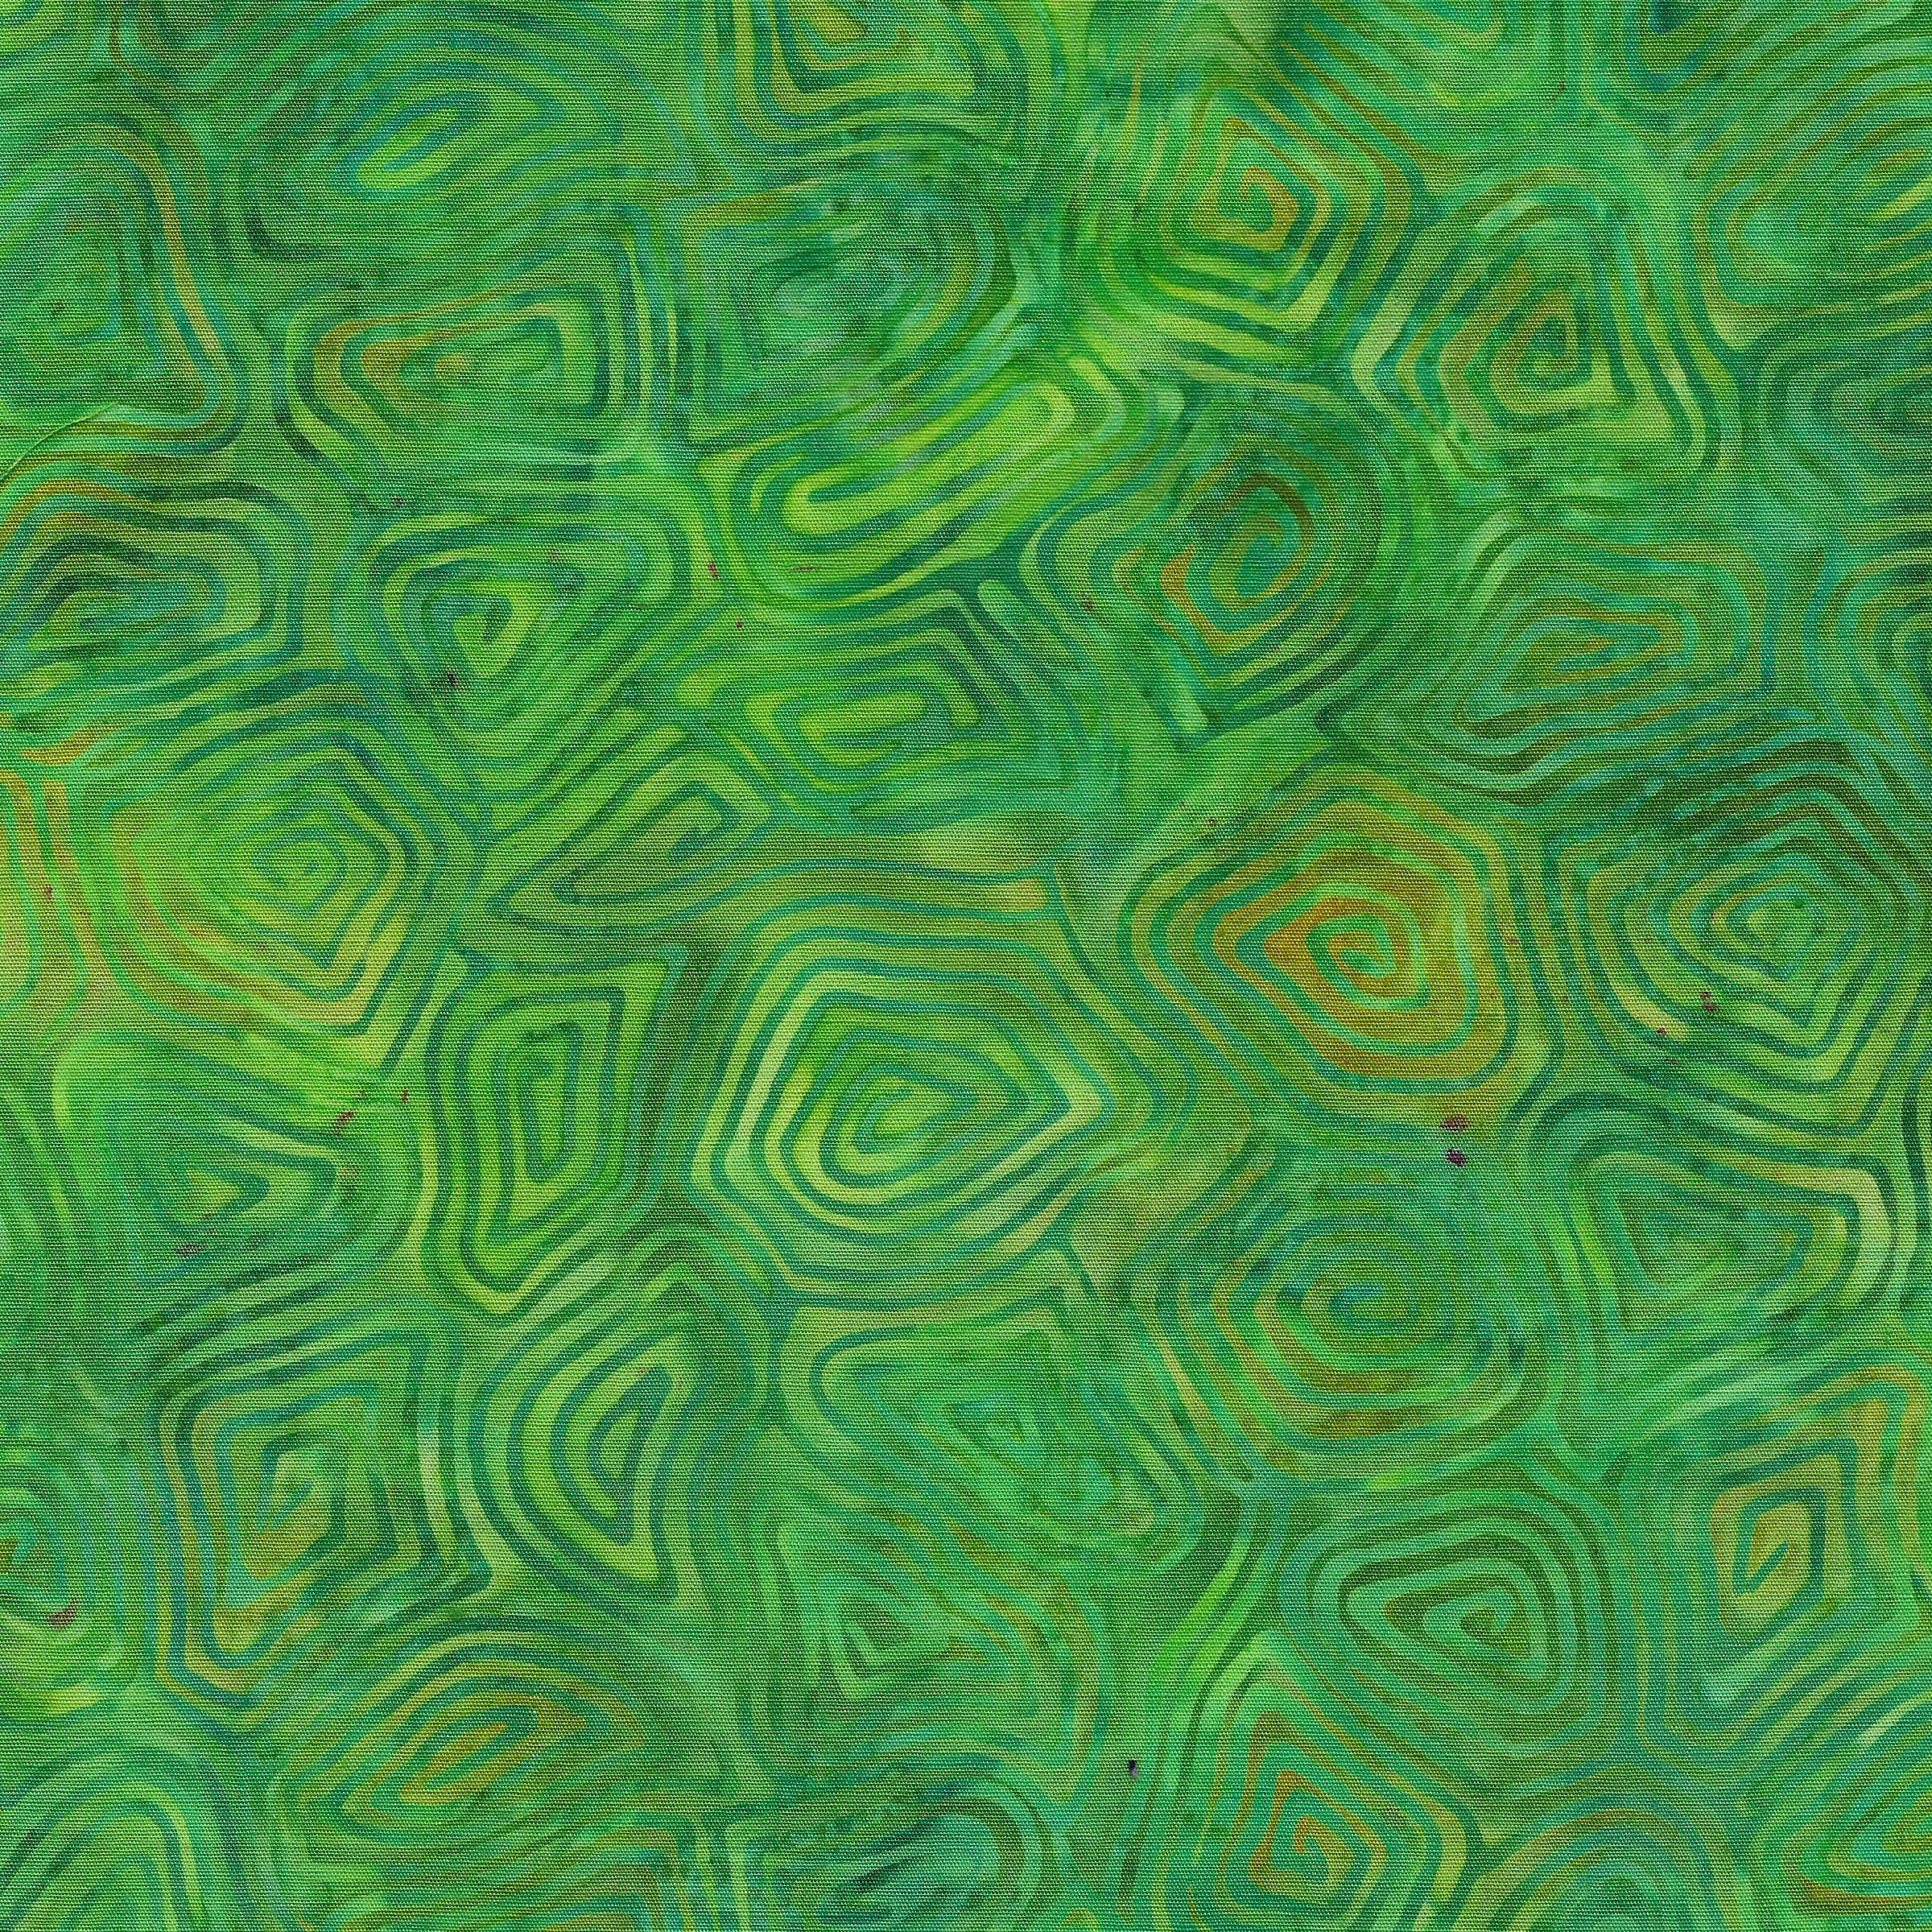 111902657 / Turtle Shell-Salamander